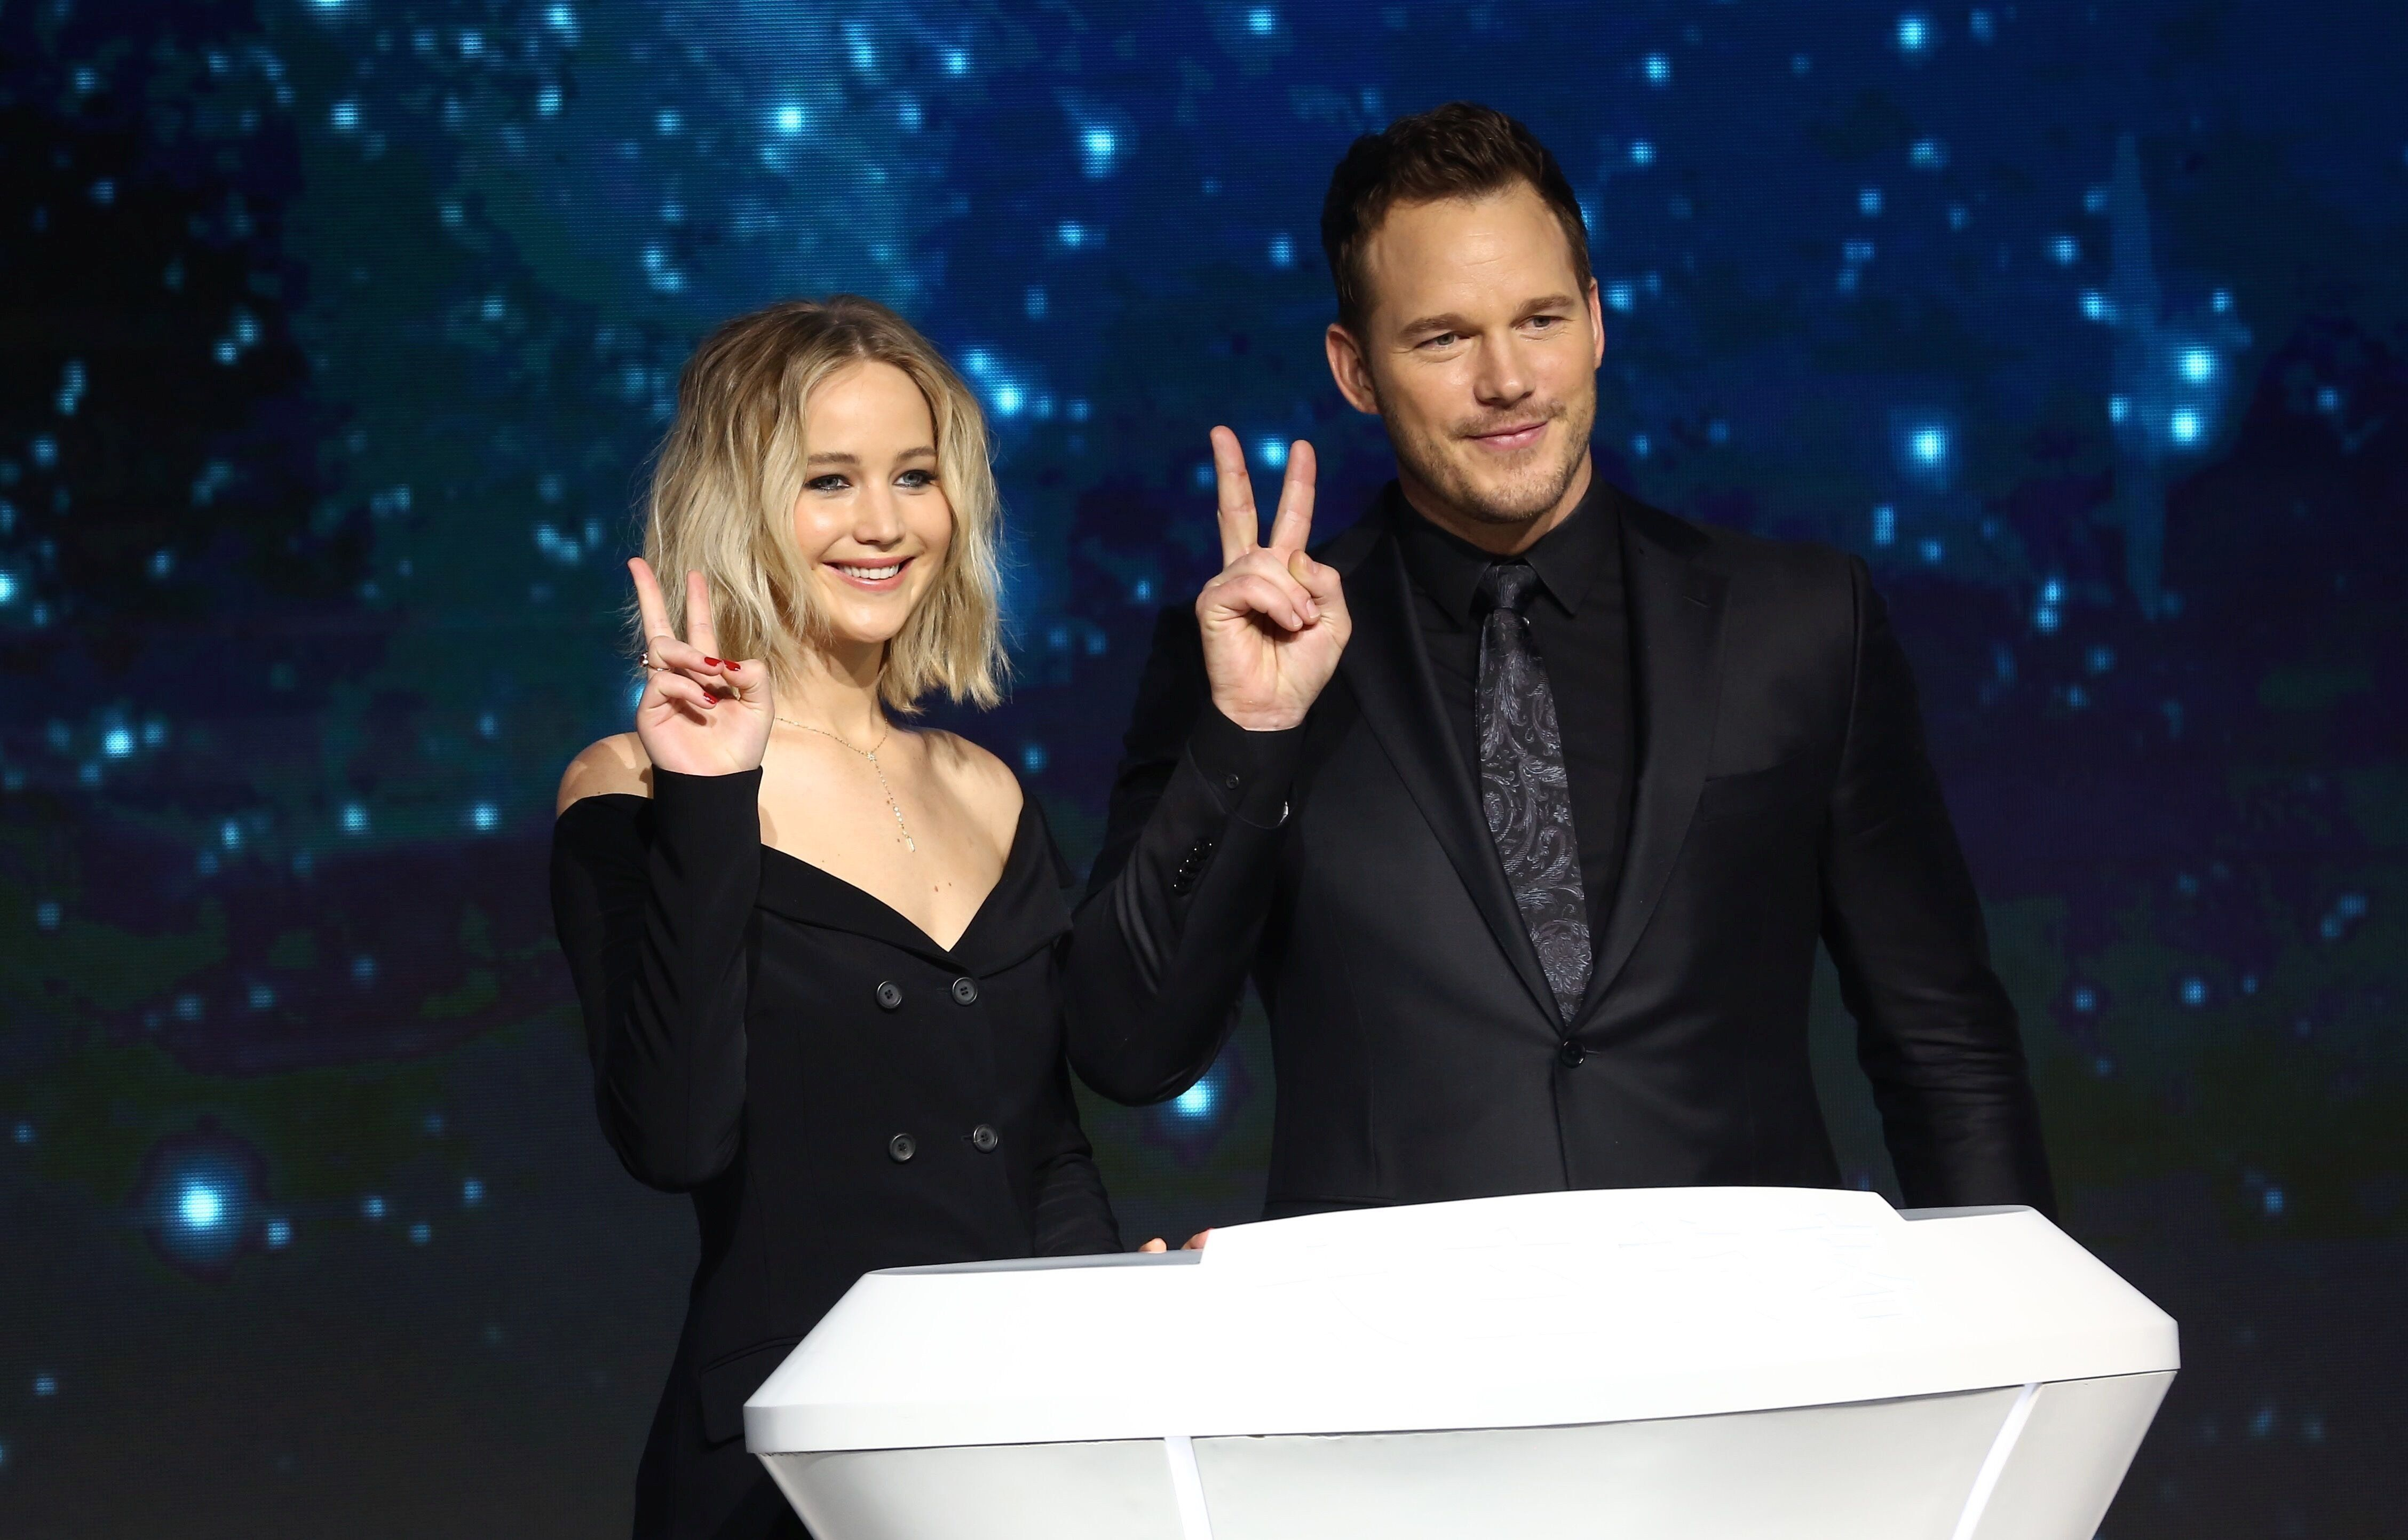 Jennifer Lawrence And Chris Pratt Want To Do A Superhero